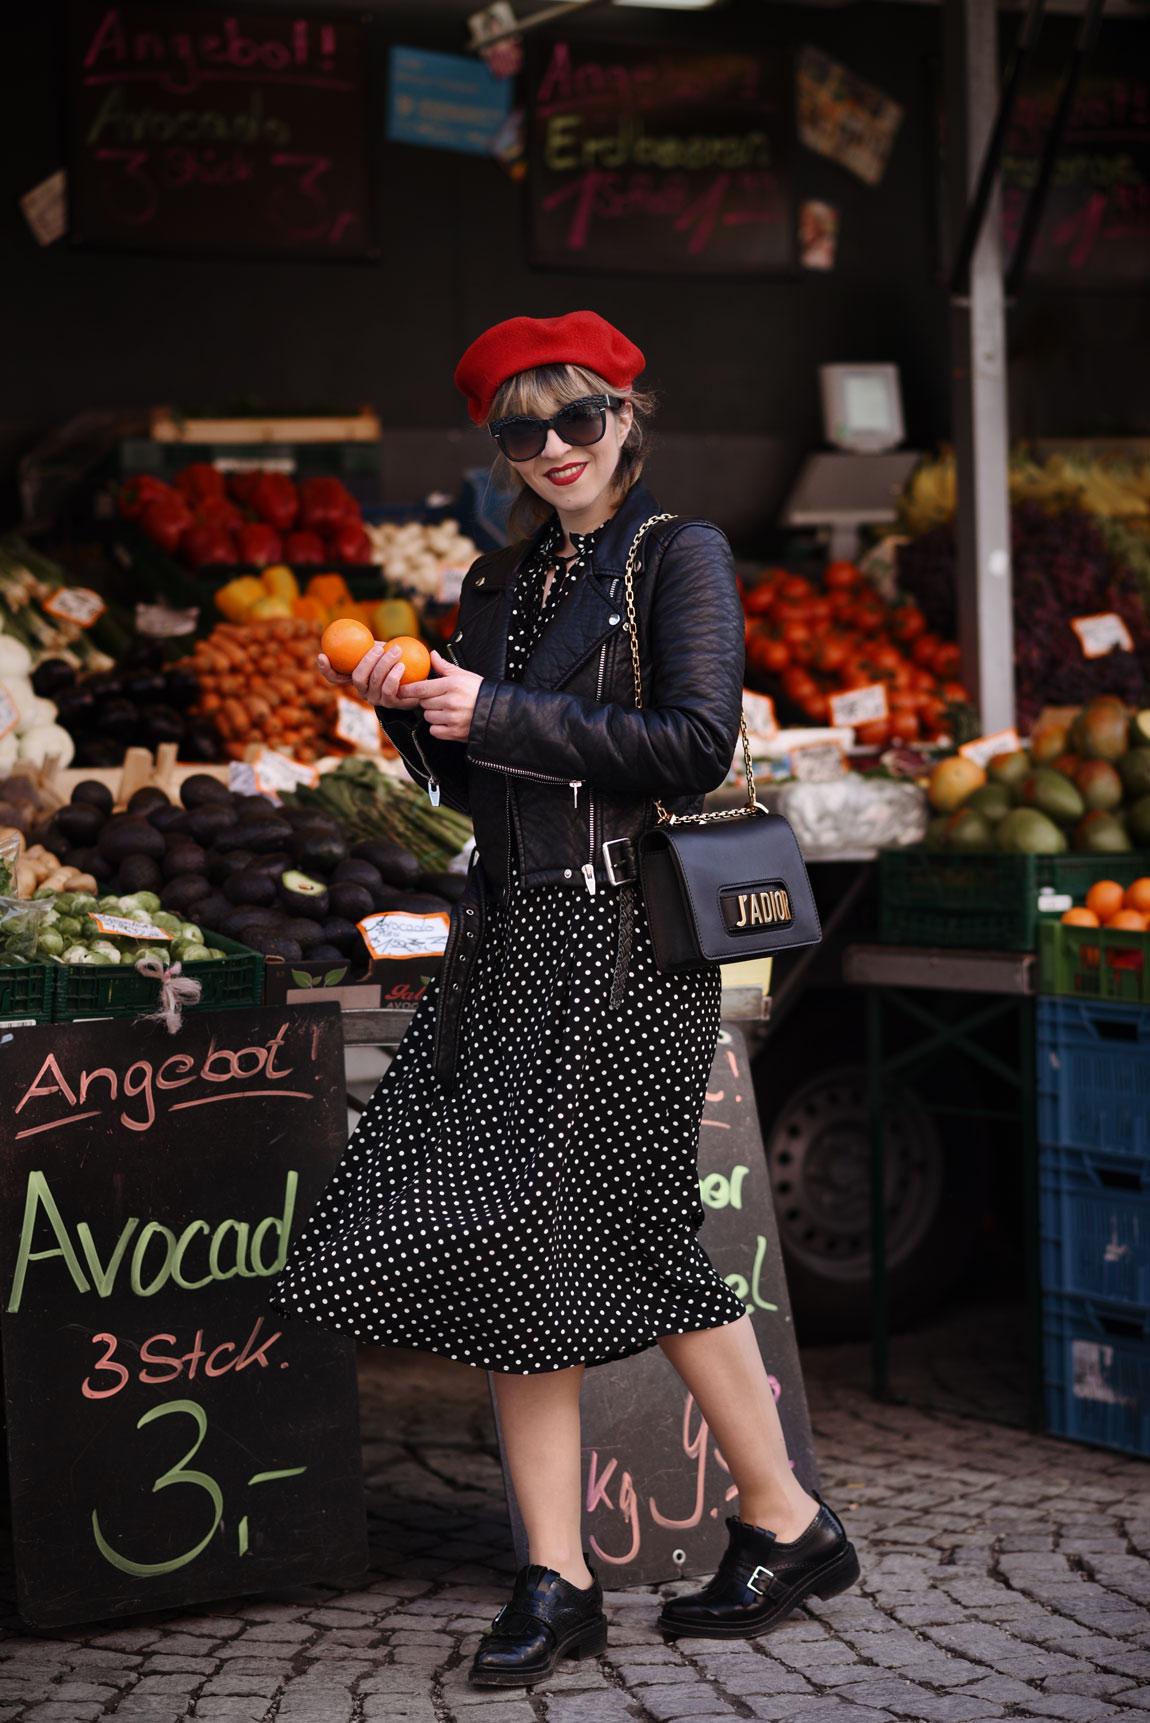 punkte, dots, gepunktet, dior, jadior, kleid, midi, dress, fashionblogger, berlin, modeblog, muenchen, trend, fruehjahr, spring, streetstyle, obststand, fruits, cute, vintage, ootd, outfit